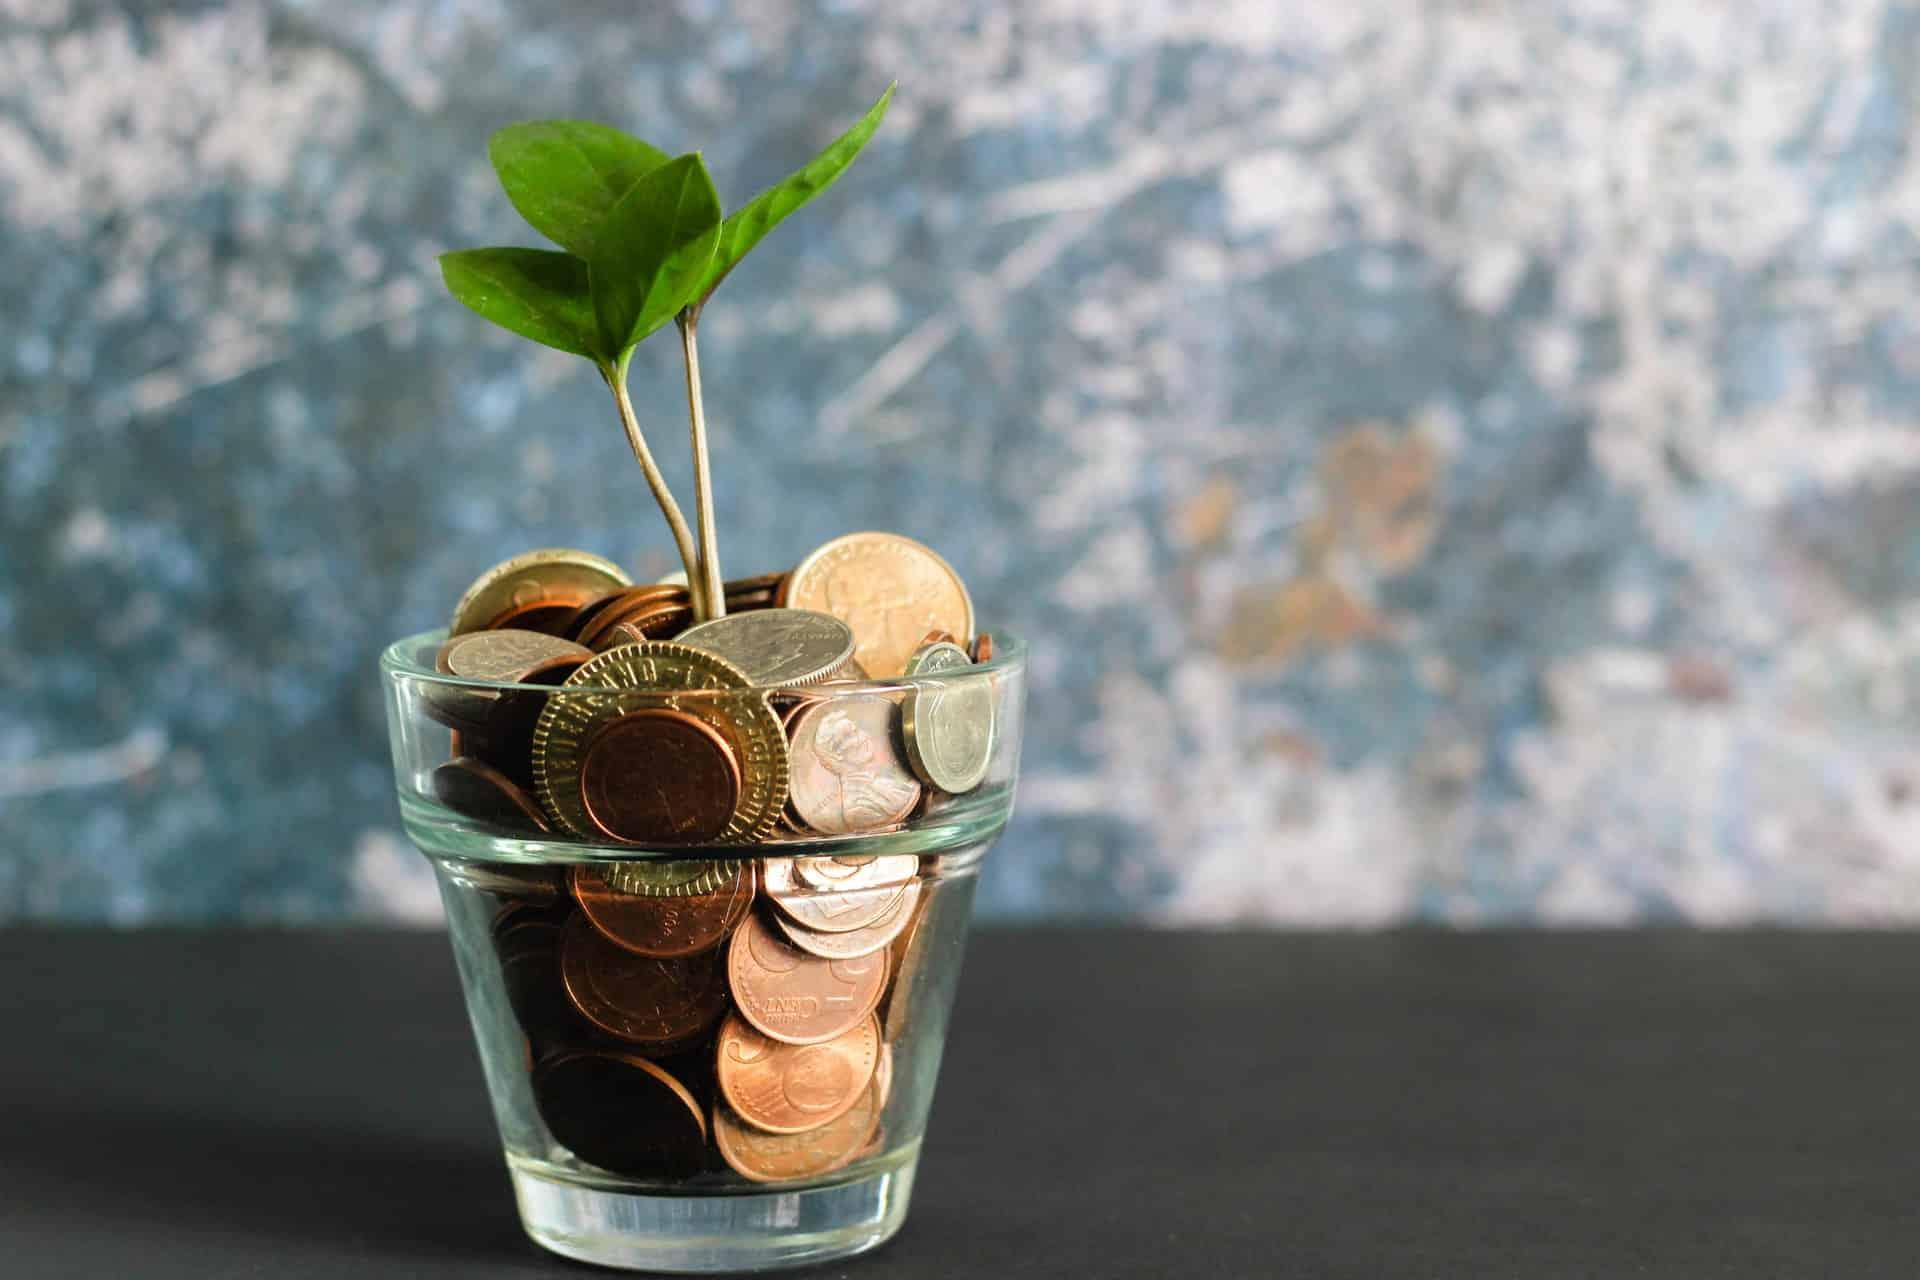 HappyCredit raises INR 5 crore in pre-seed round